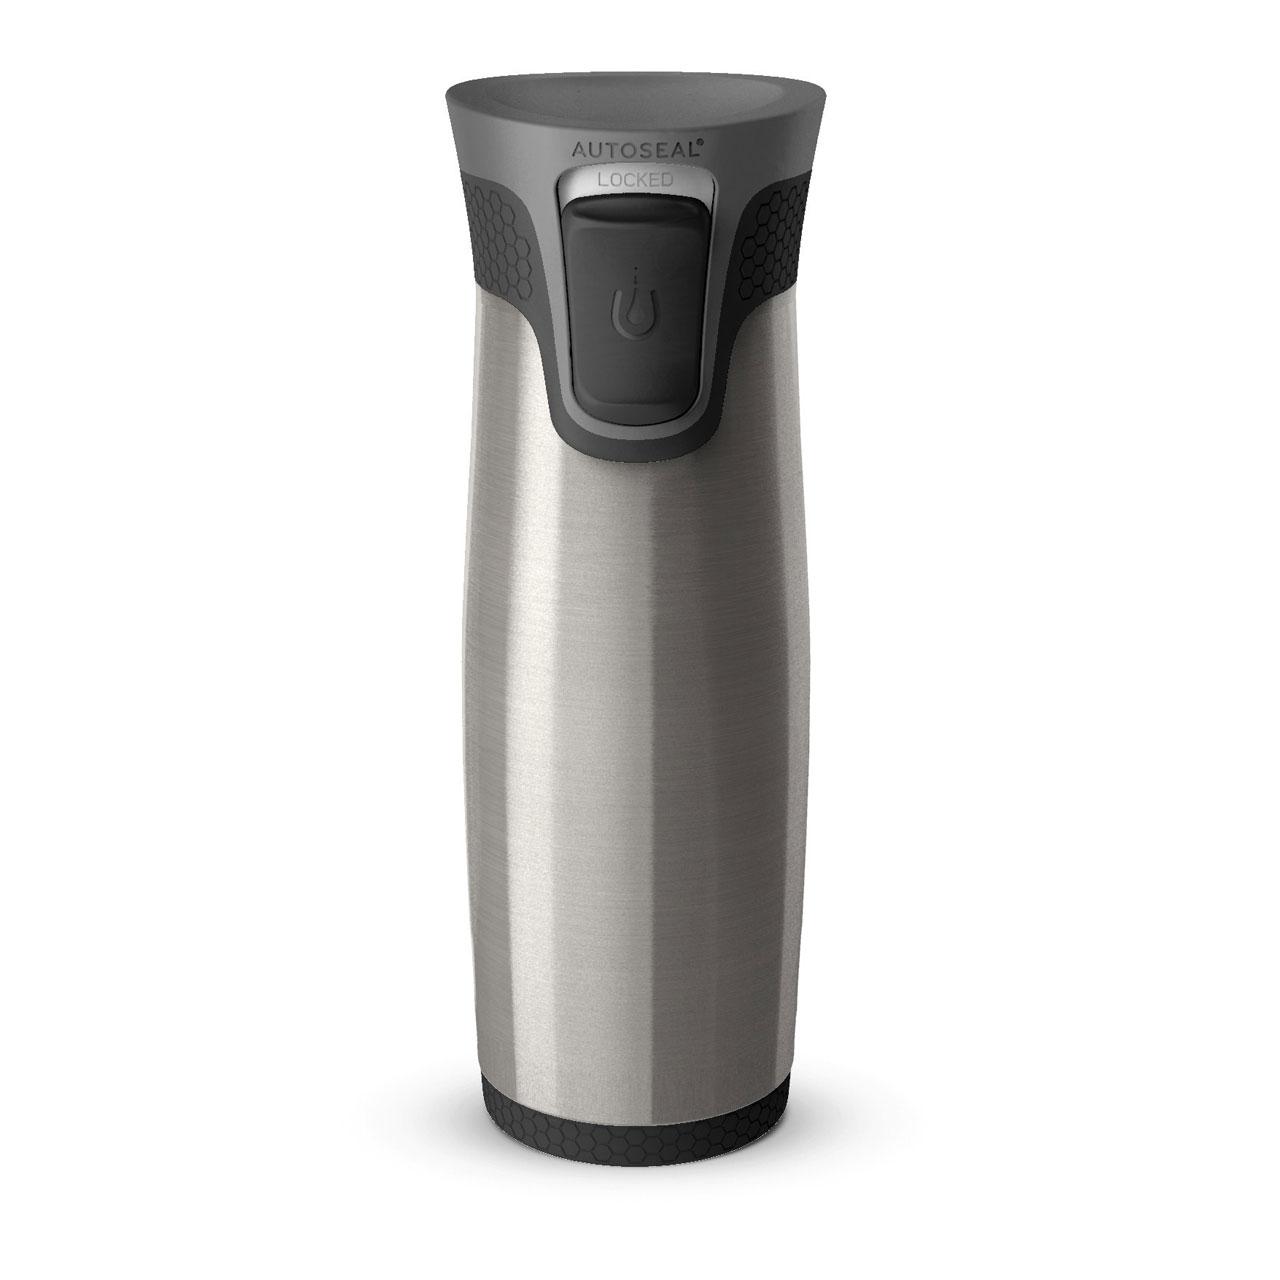 Cup Grey Insulated Tea Black 470ml Coffee Thermal About Details Contigo Autoseal Aria Mug eH2WEID9Y